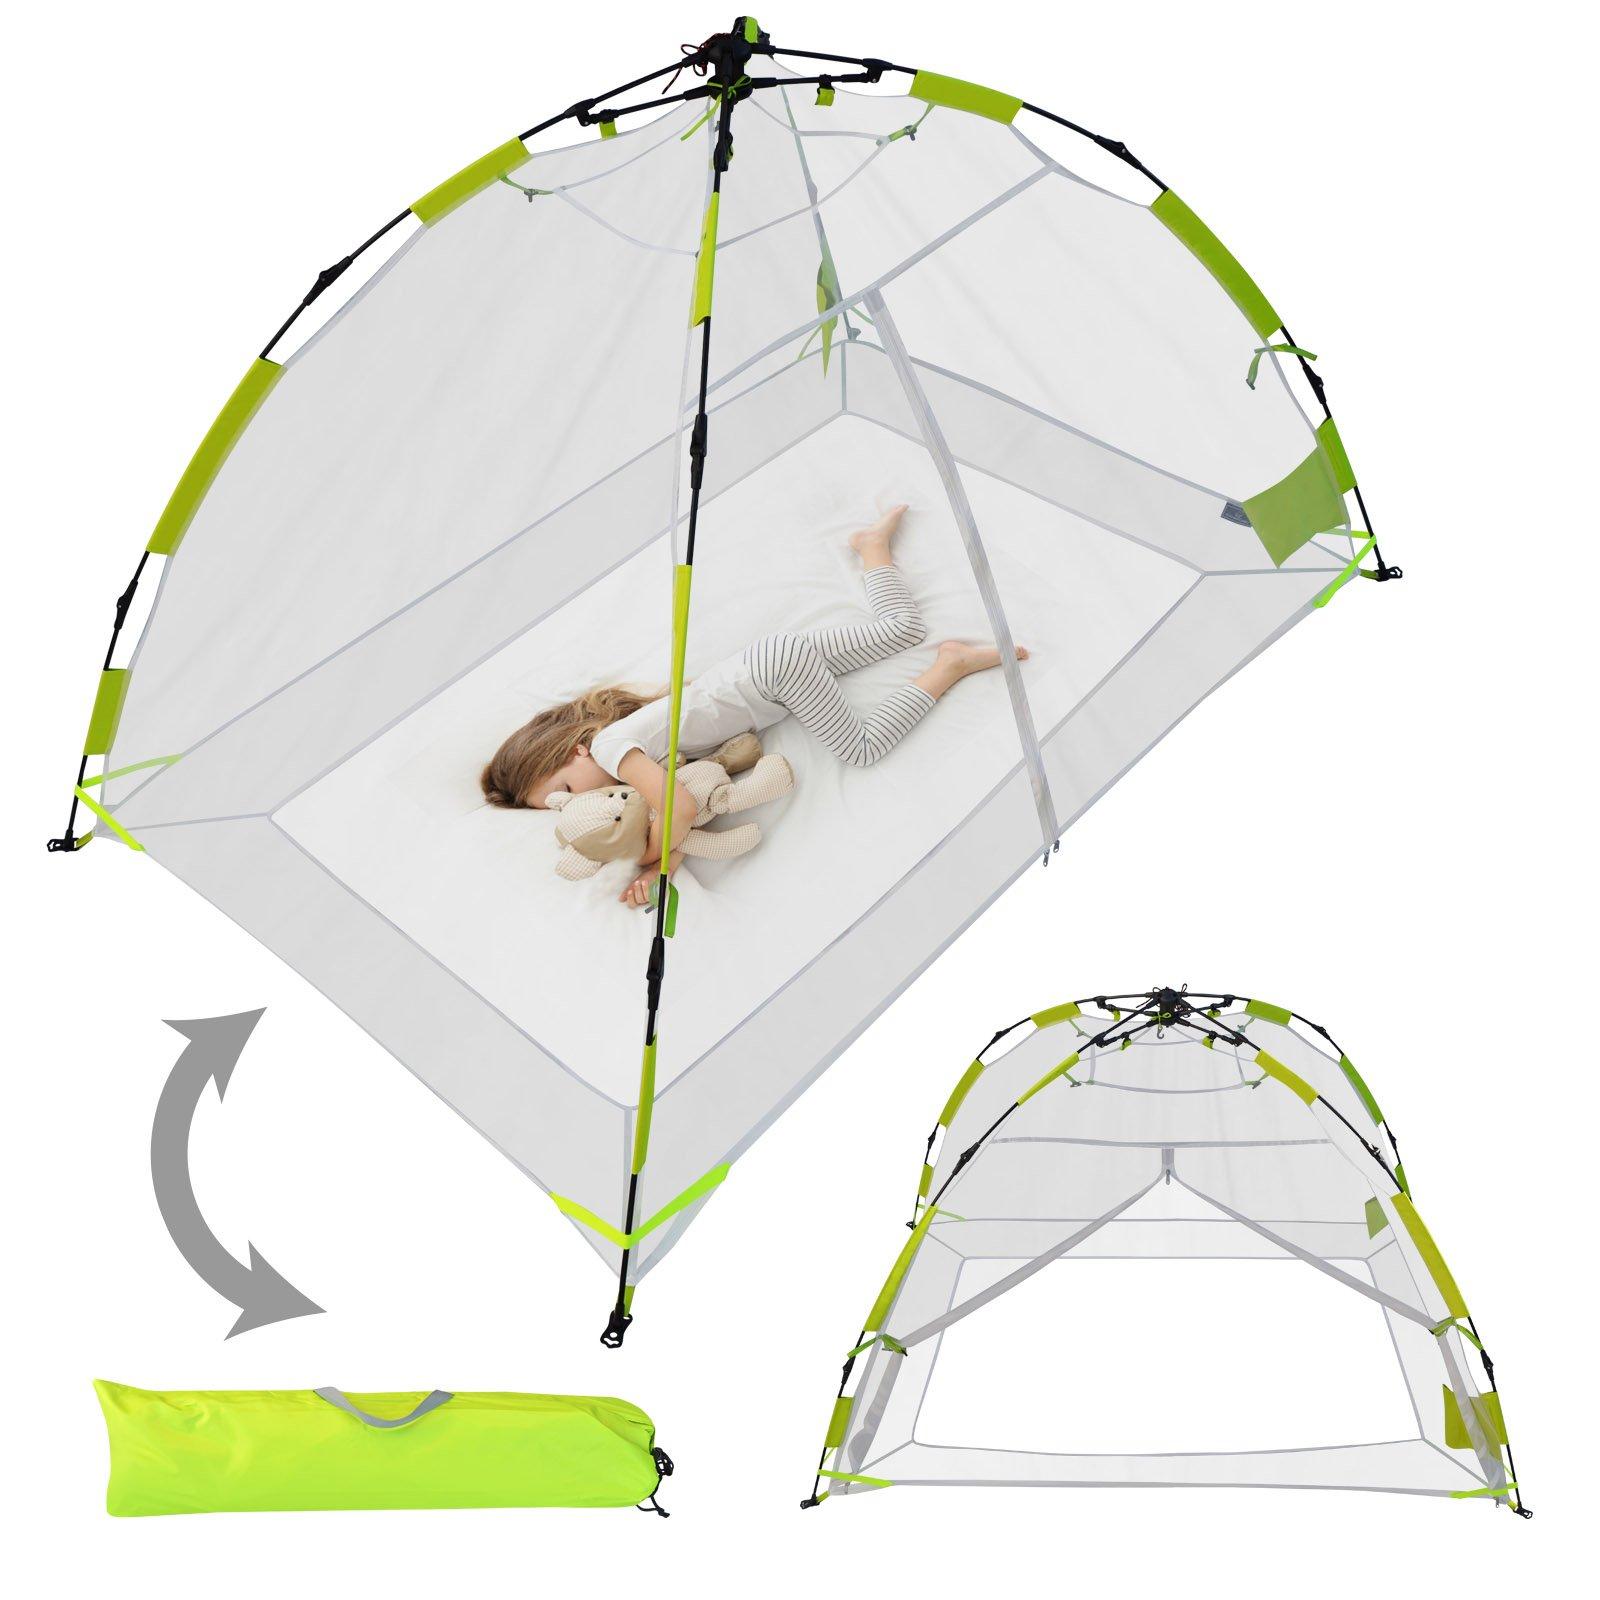 BenefitUSA Kid Family Pet Mosquito Net Multi-use Pop up Instant Tent Indoor Camping Outdoor